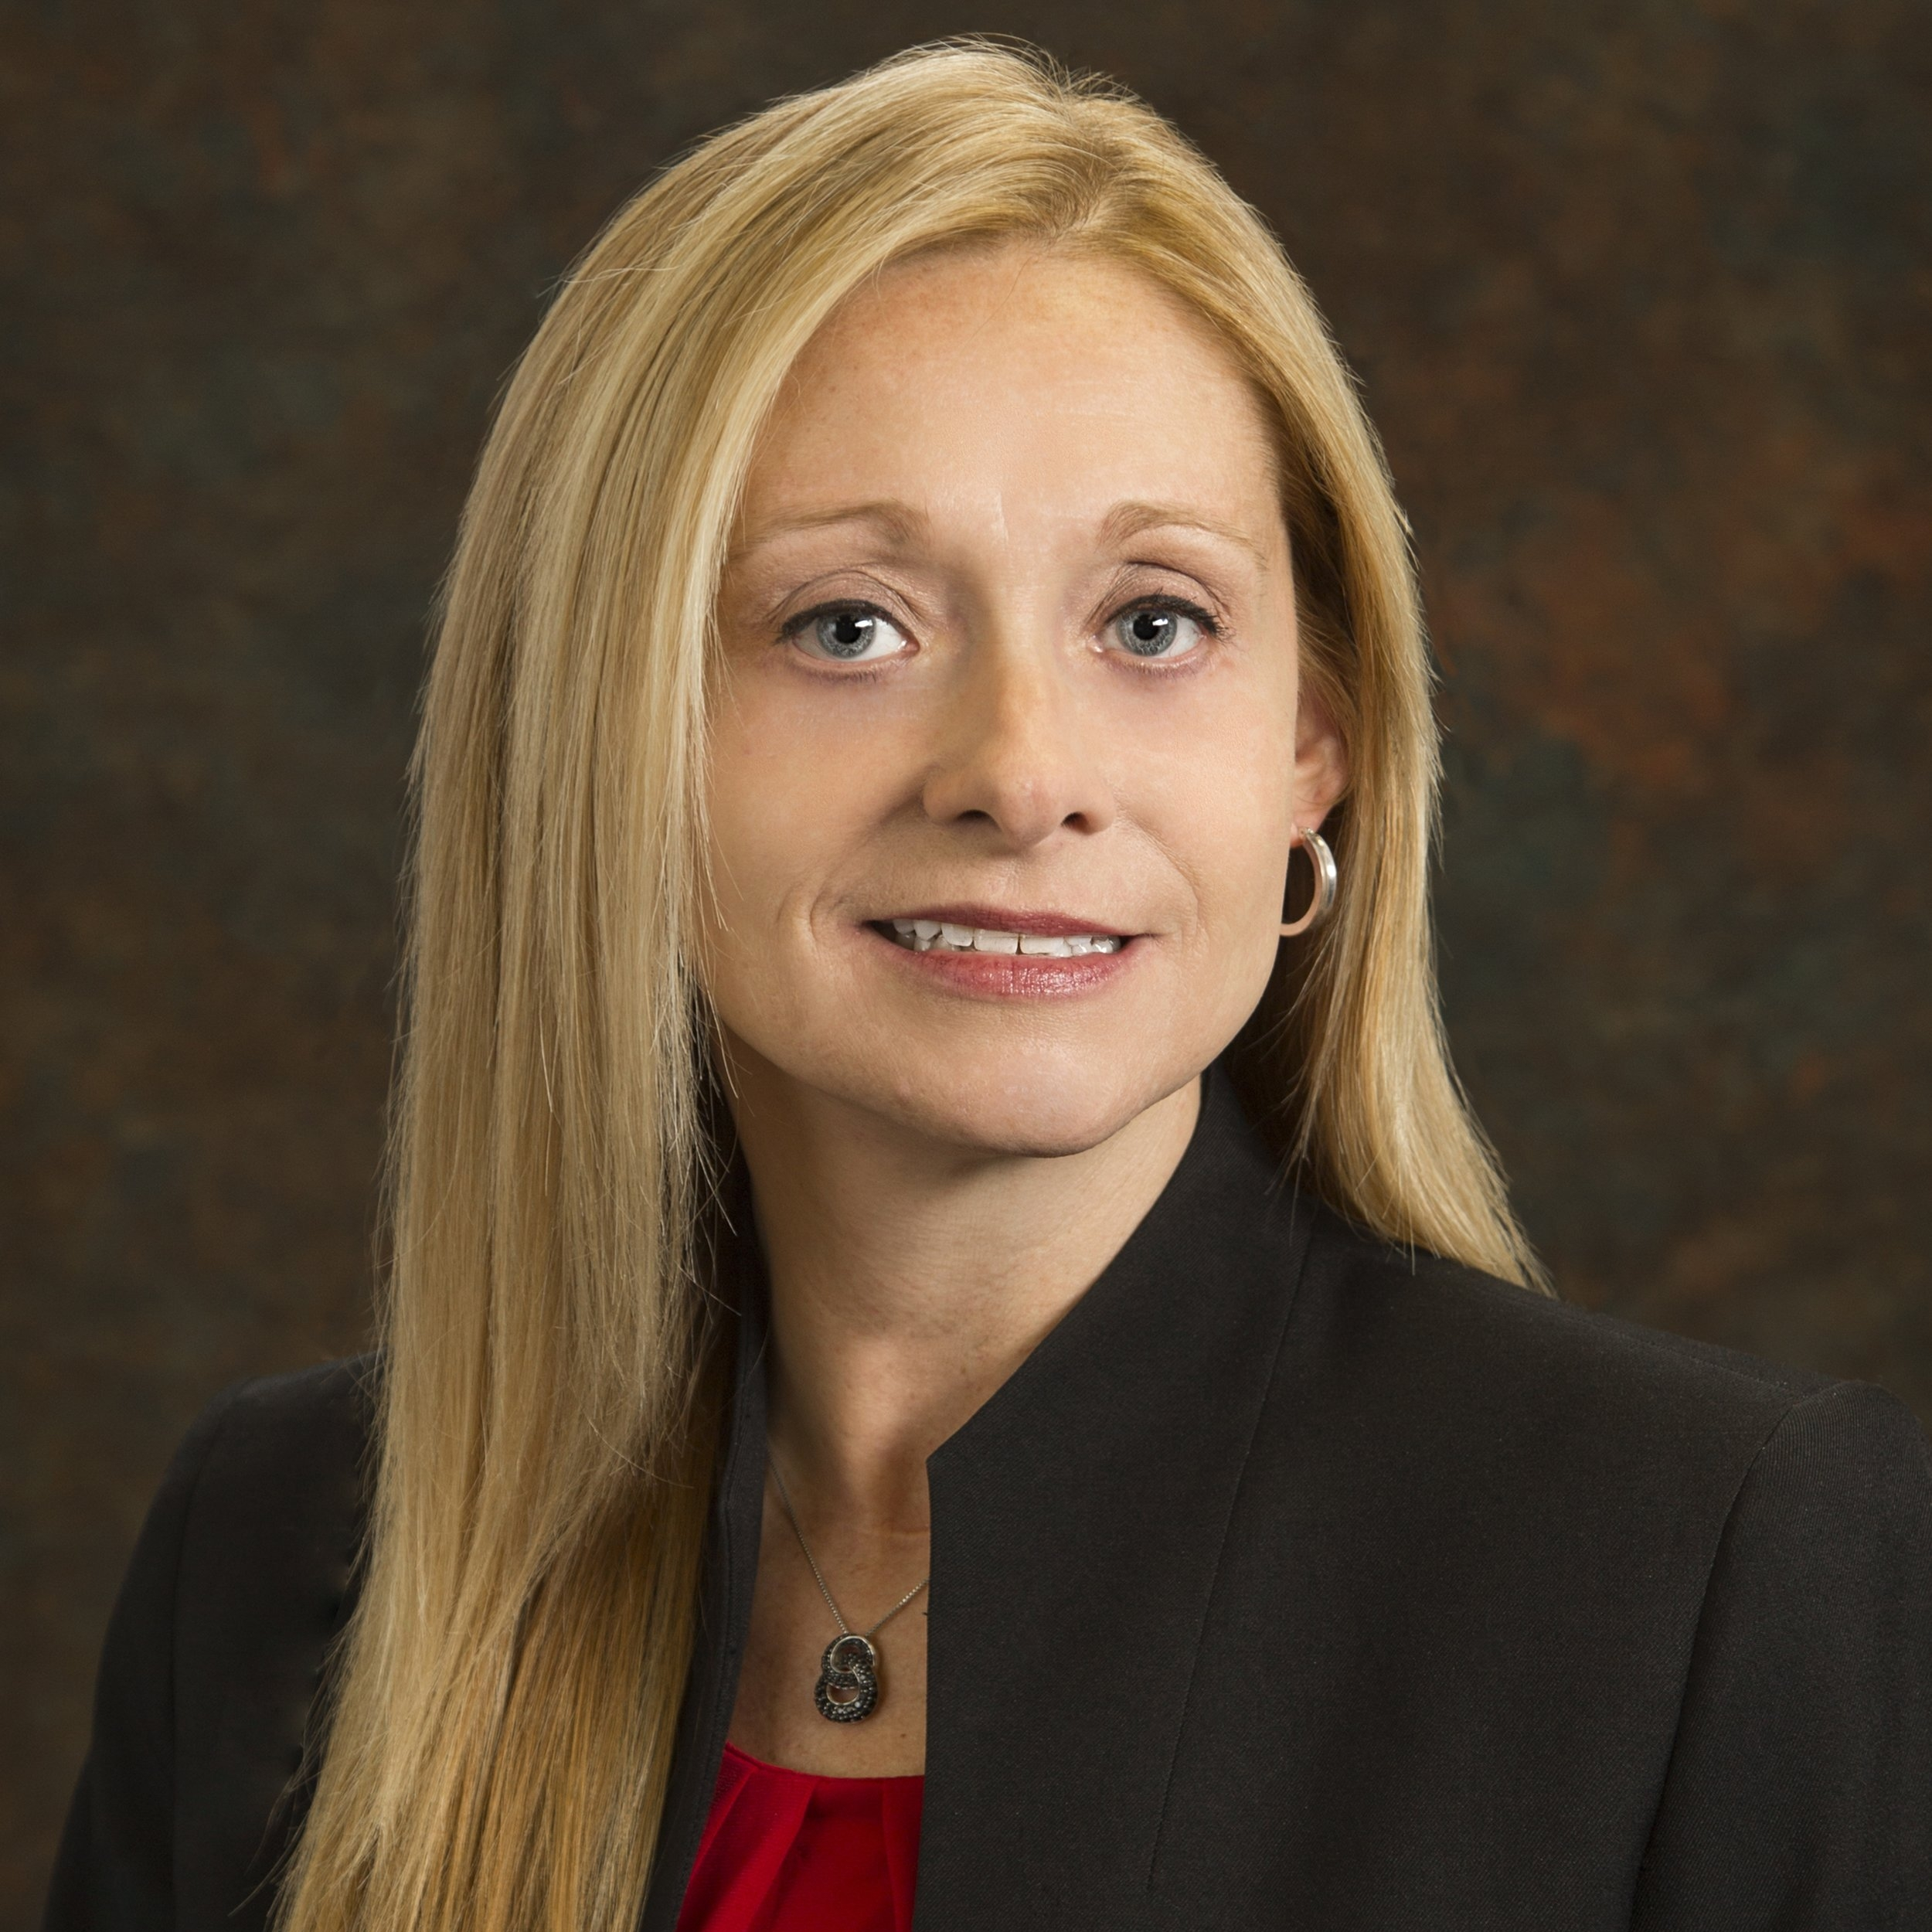 Kimberly Bash (Sec/Tre) - Program Director at The Community Foundation